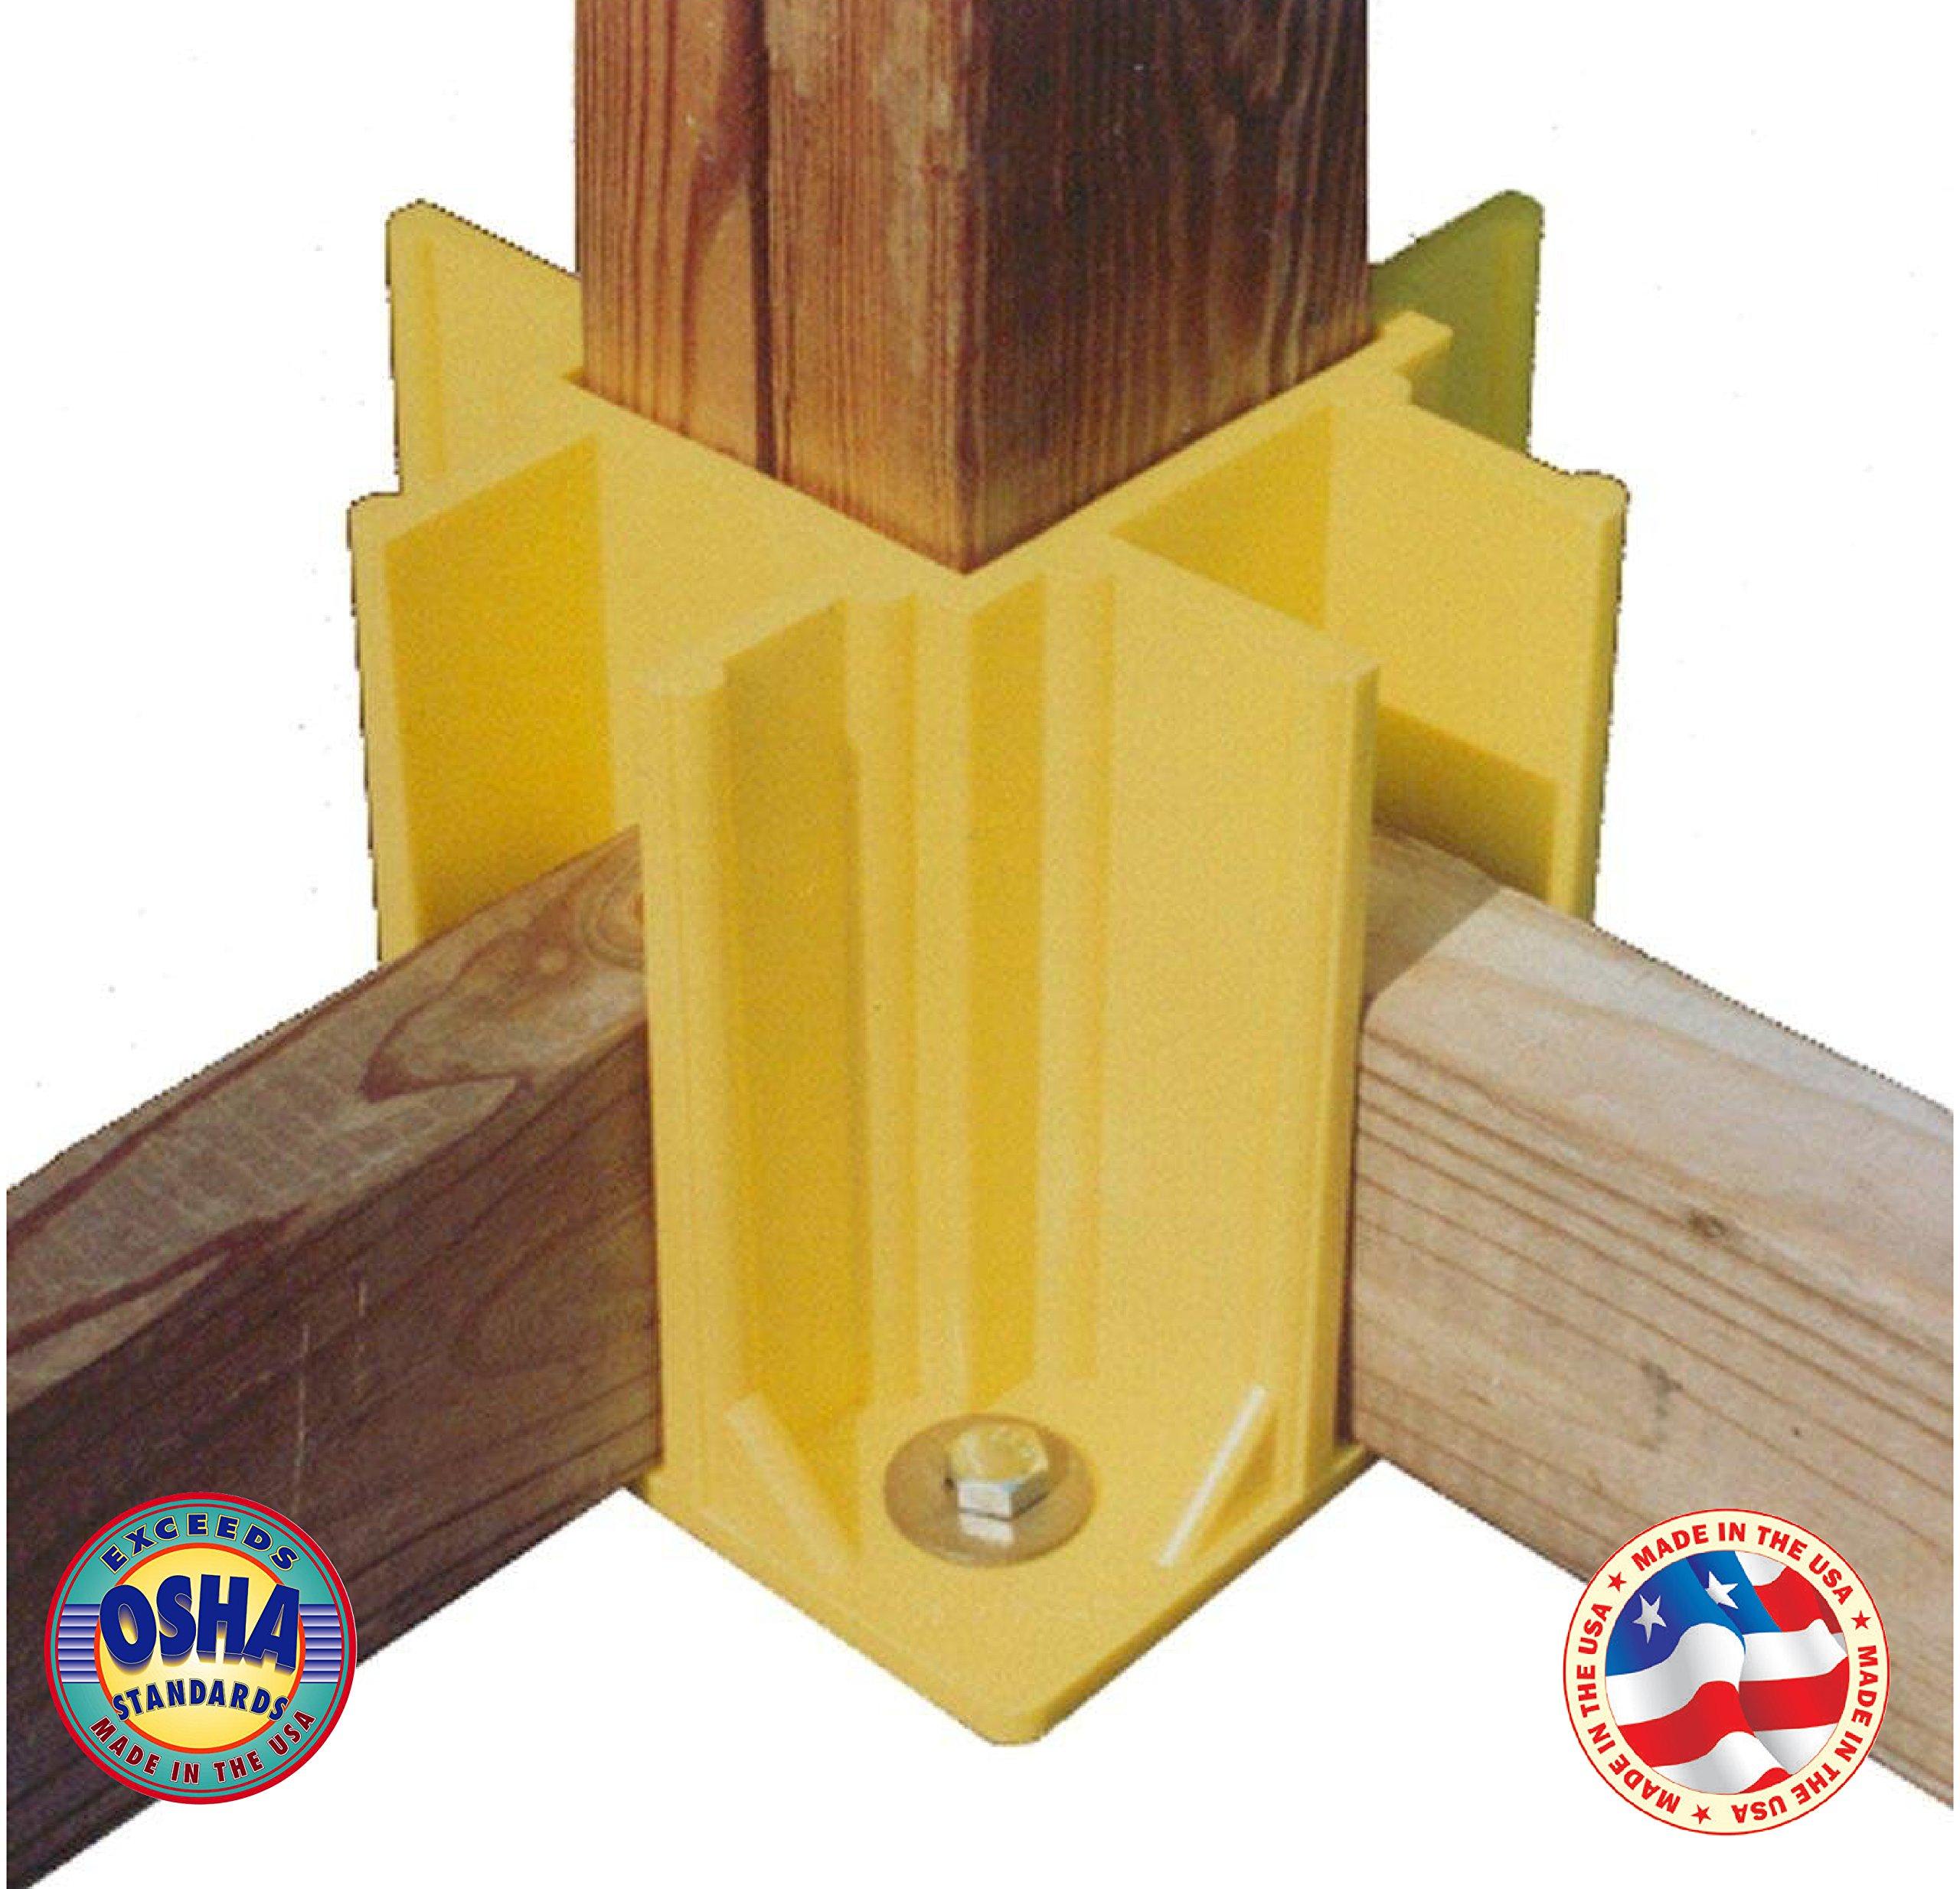 Safety Boot Yellow OSHA Temporary Guard Rail System by Safety Maker (12 Units) by Safety Maker, Inc. (Image #3)